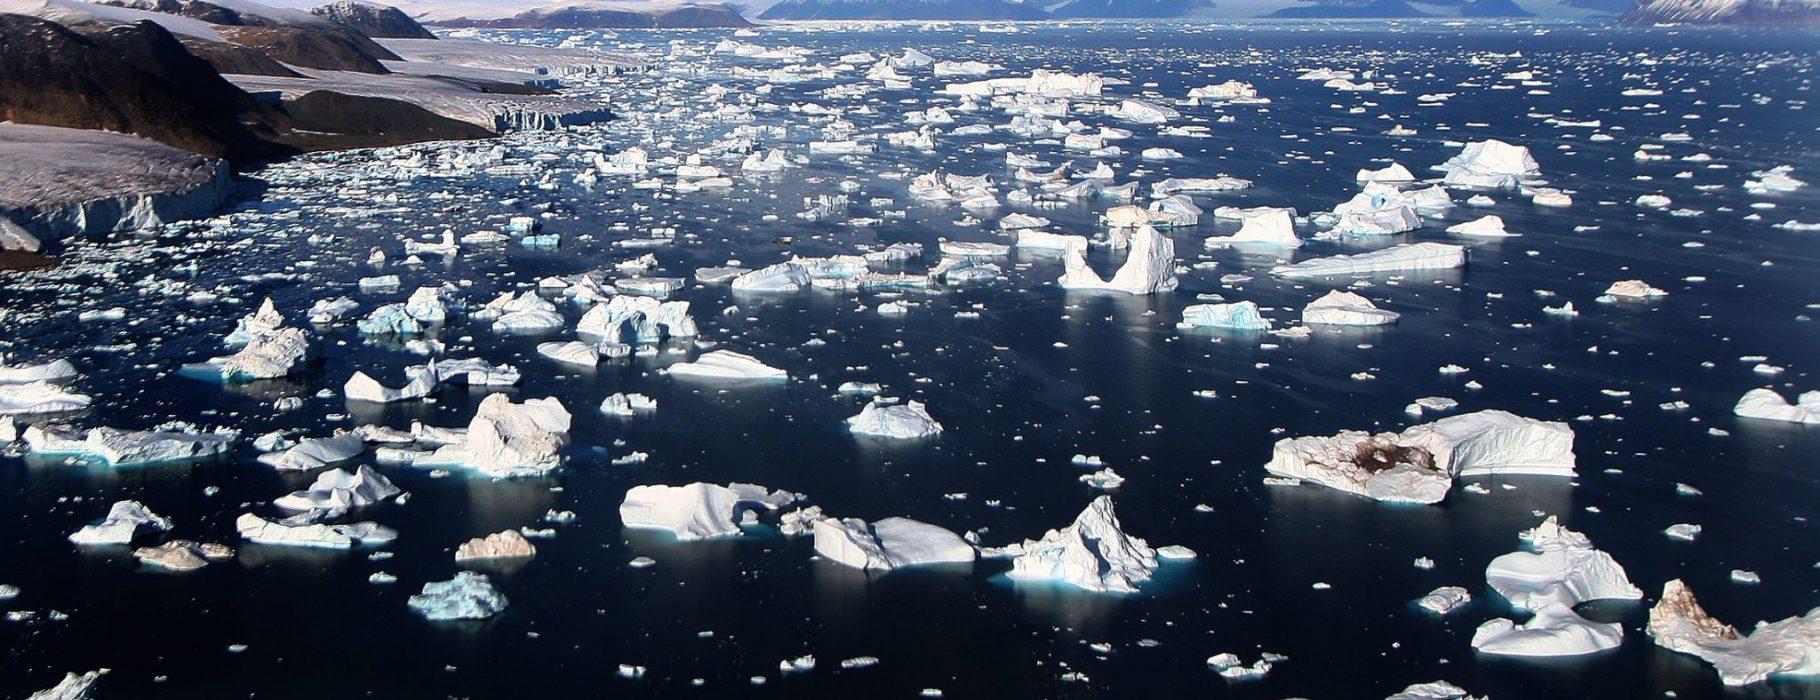 Glaciers_and_Icebergs_at_Cape_York